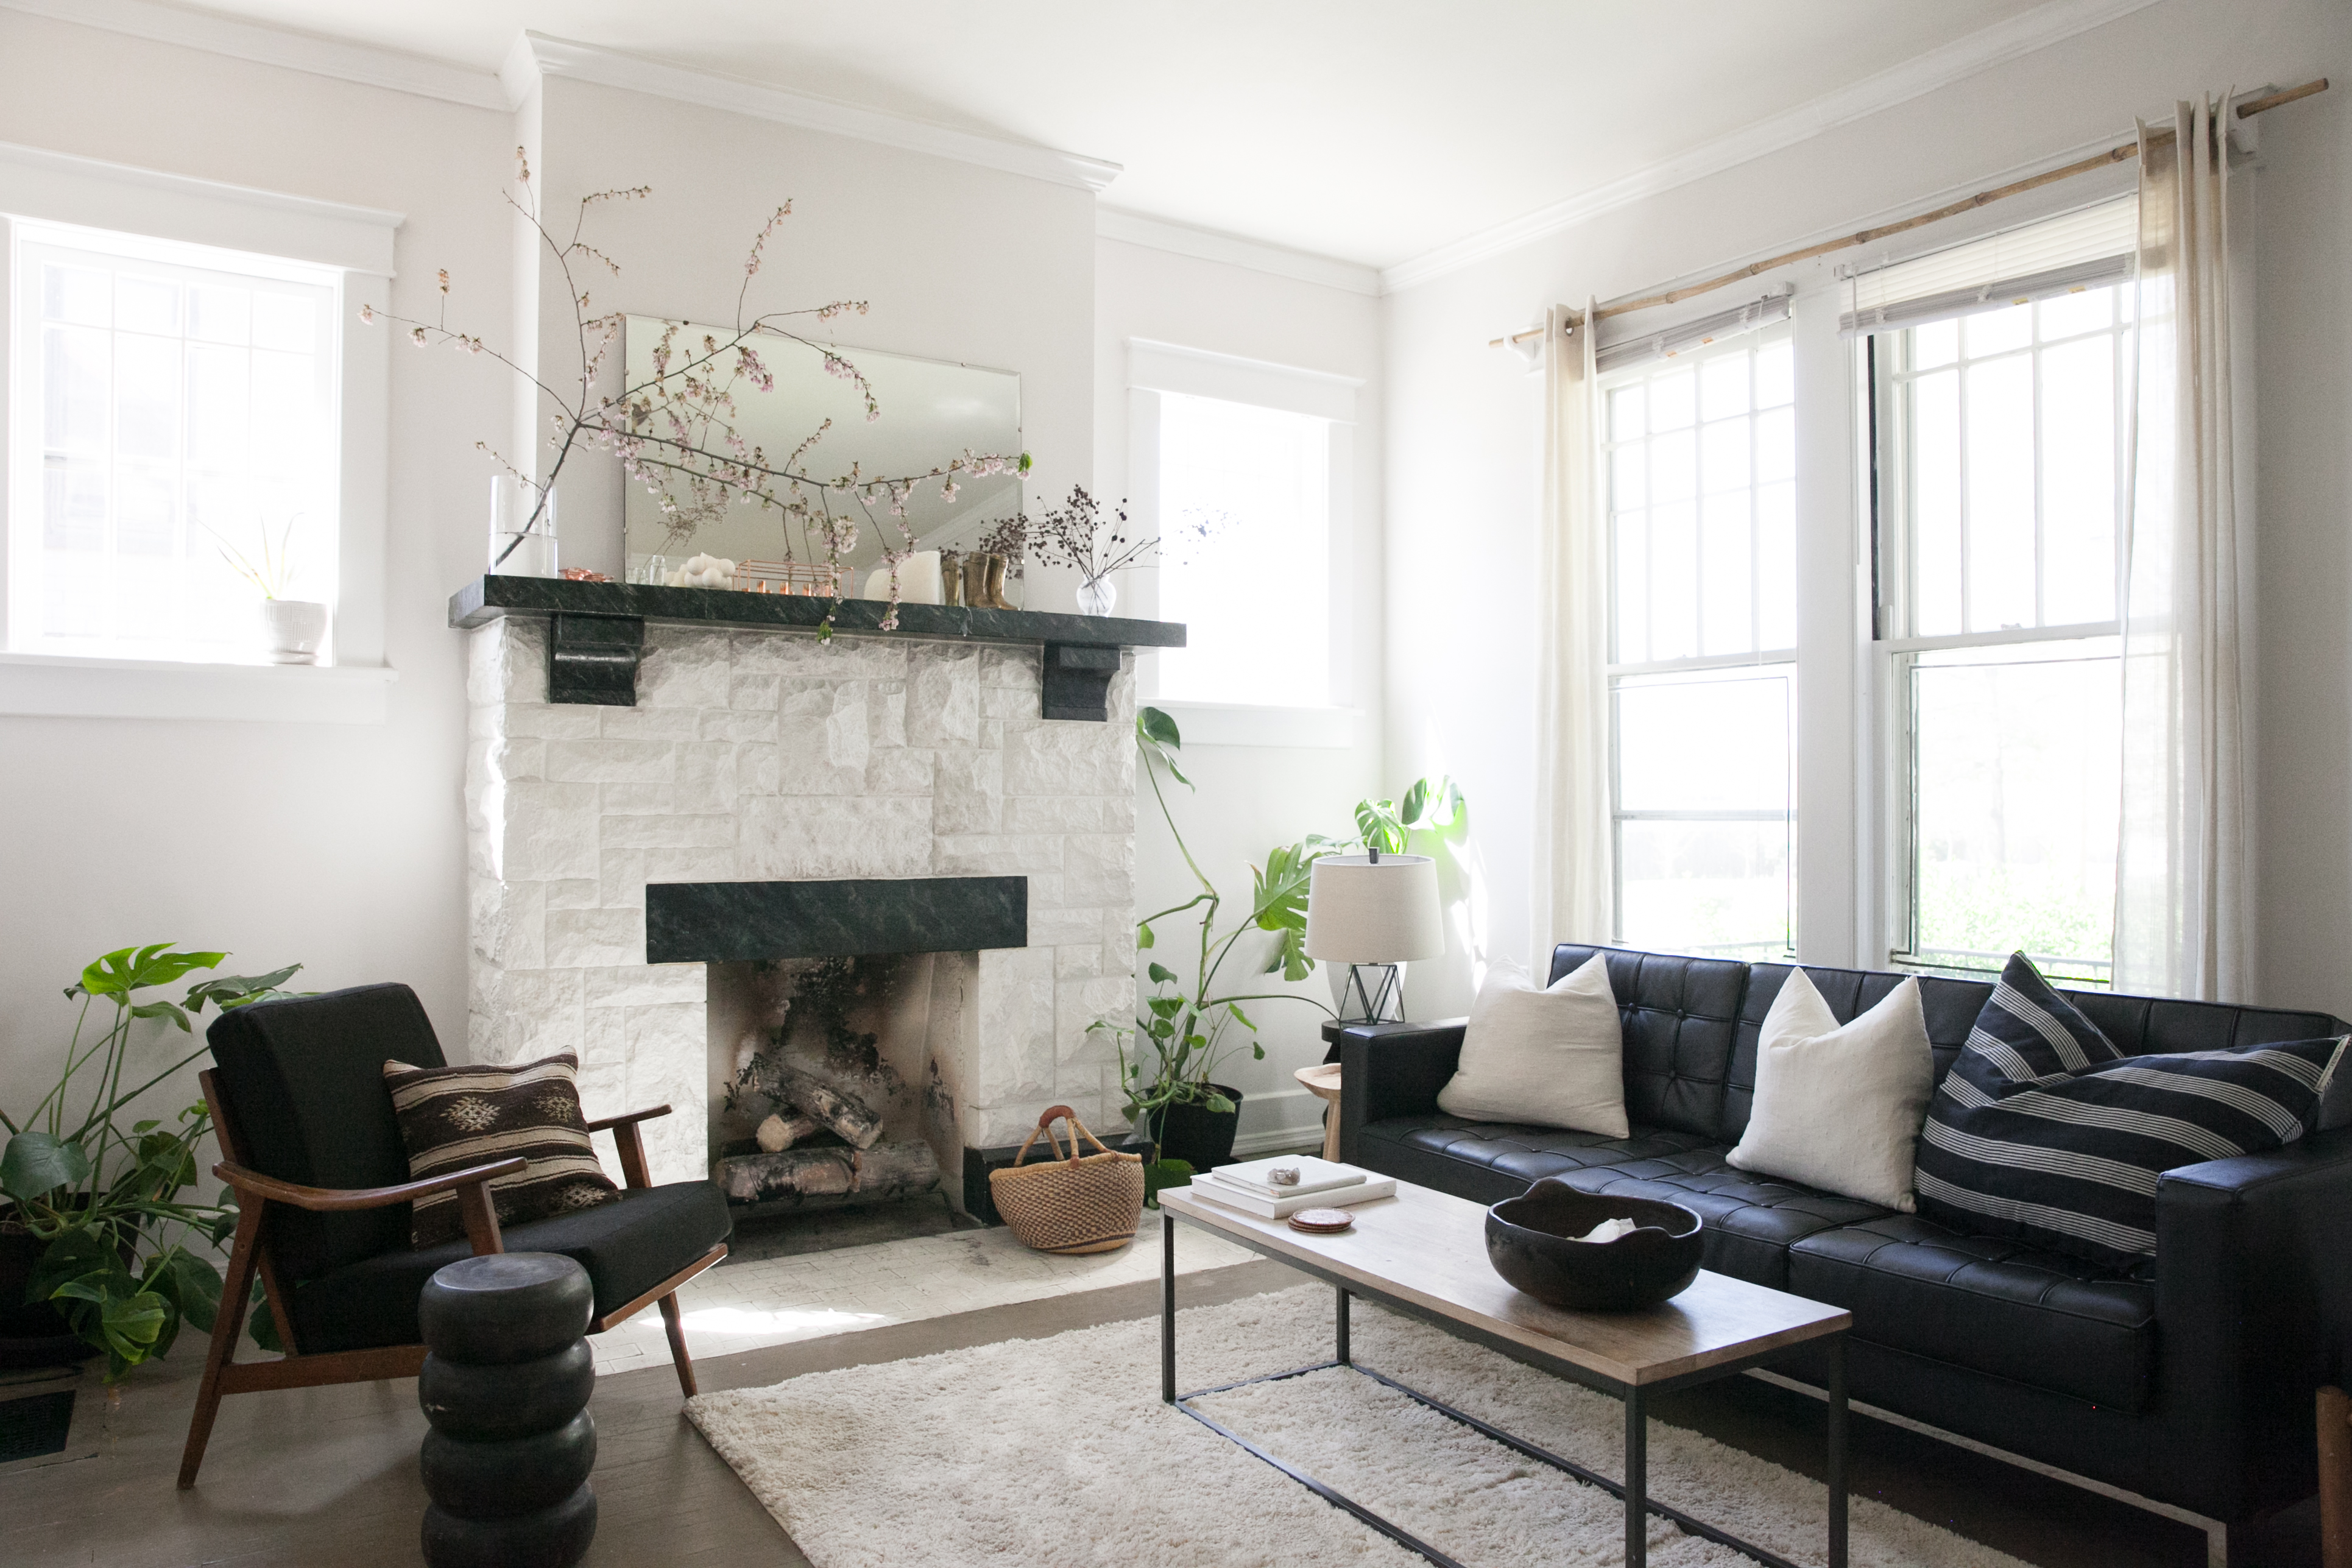 2 sofas in living room